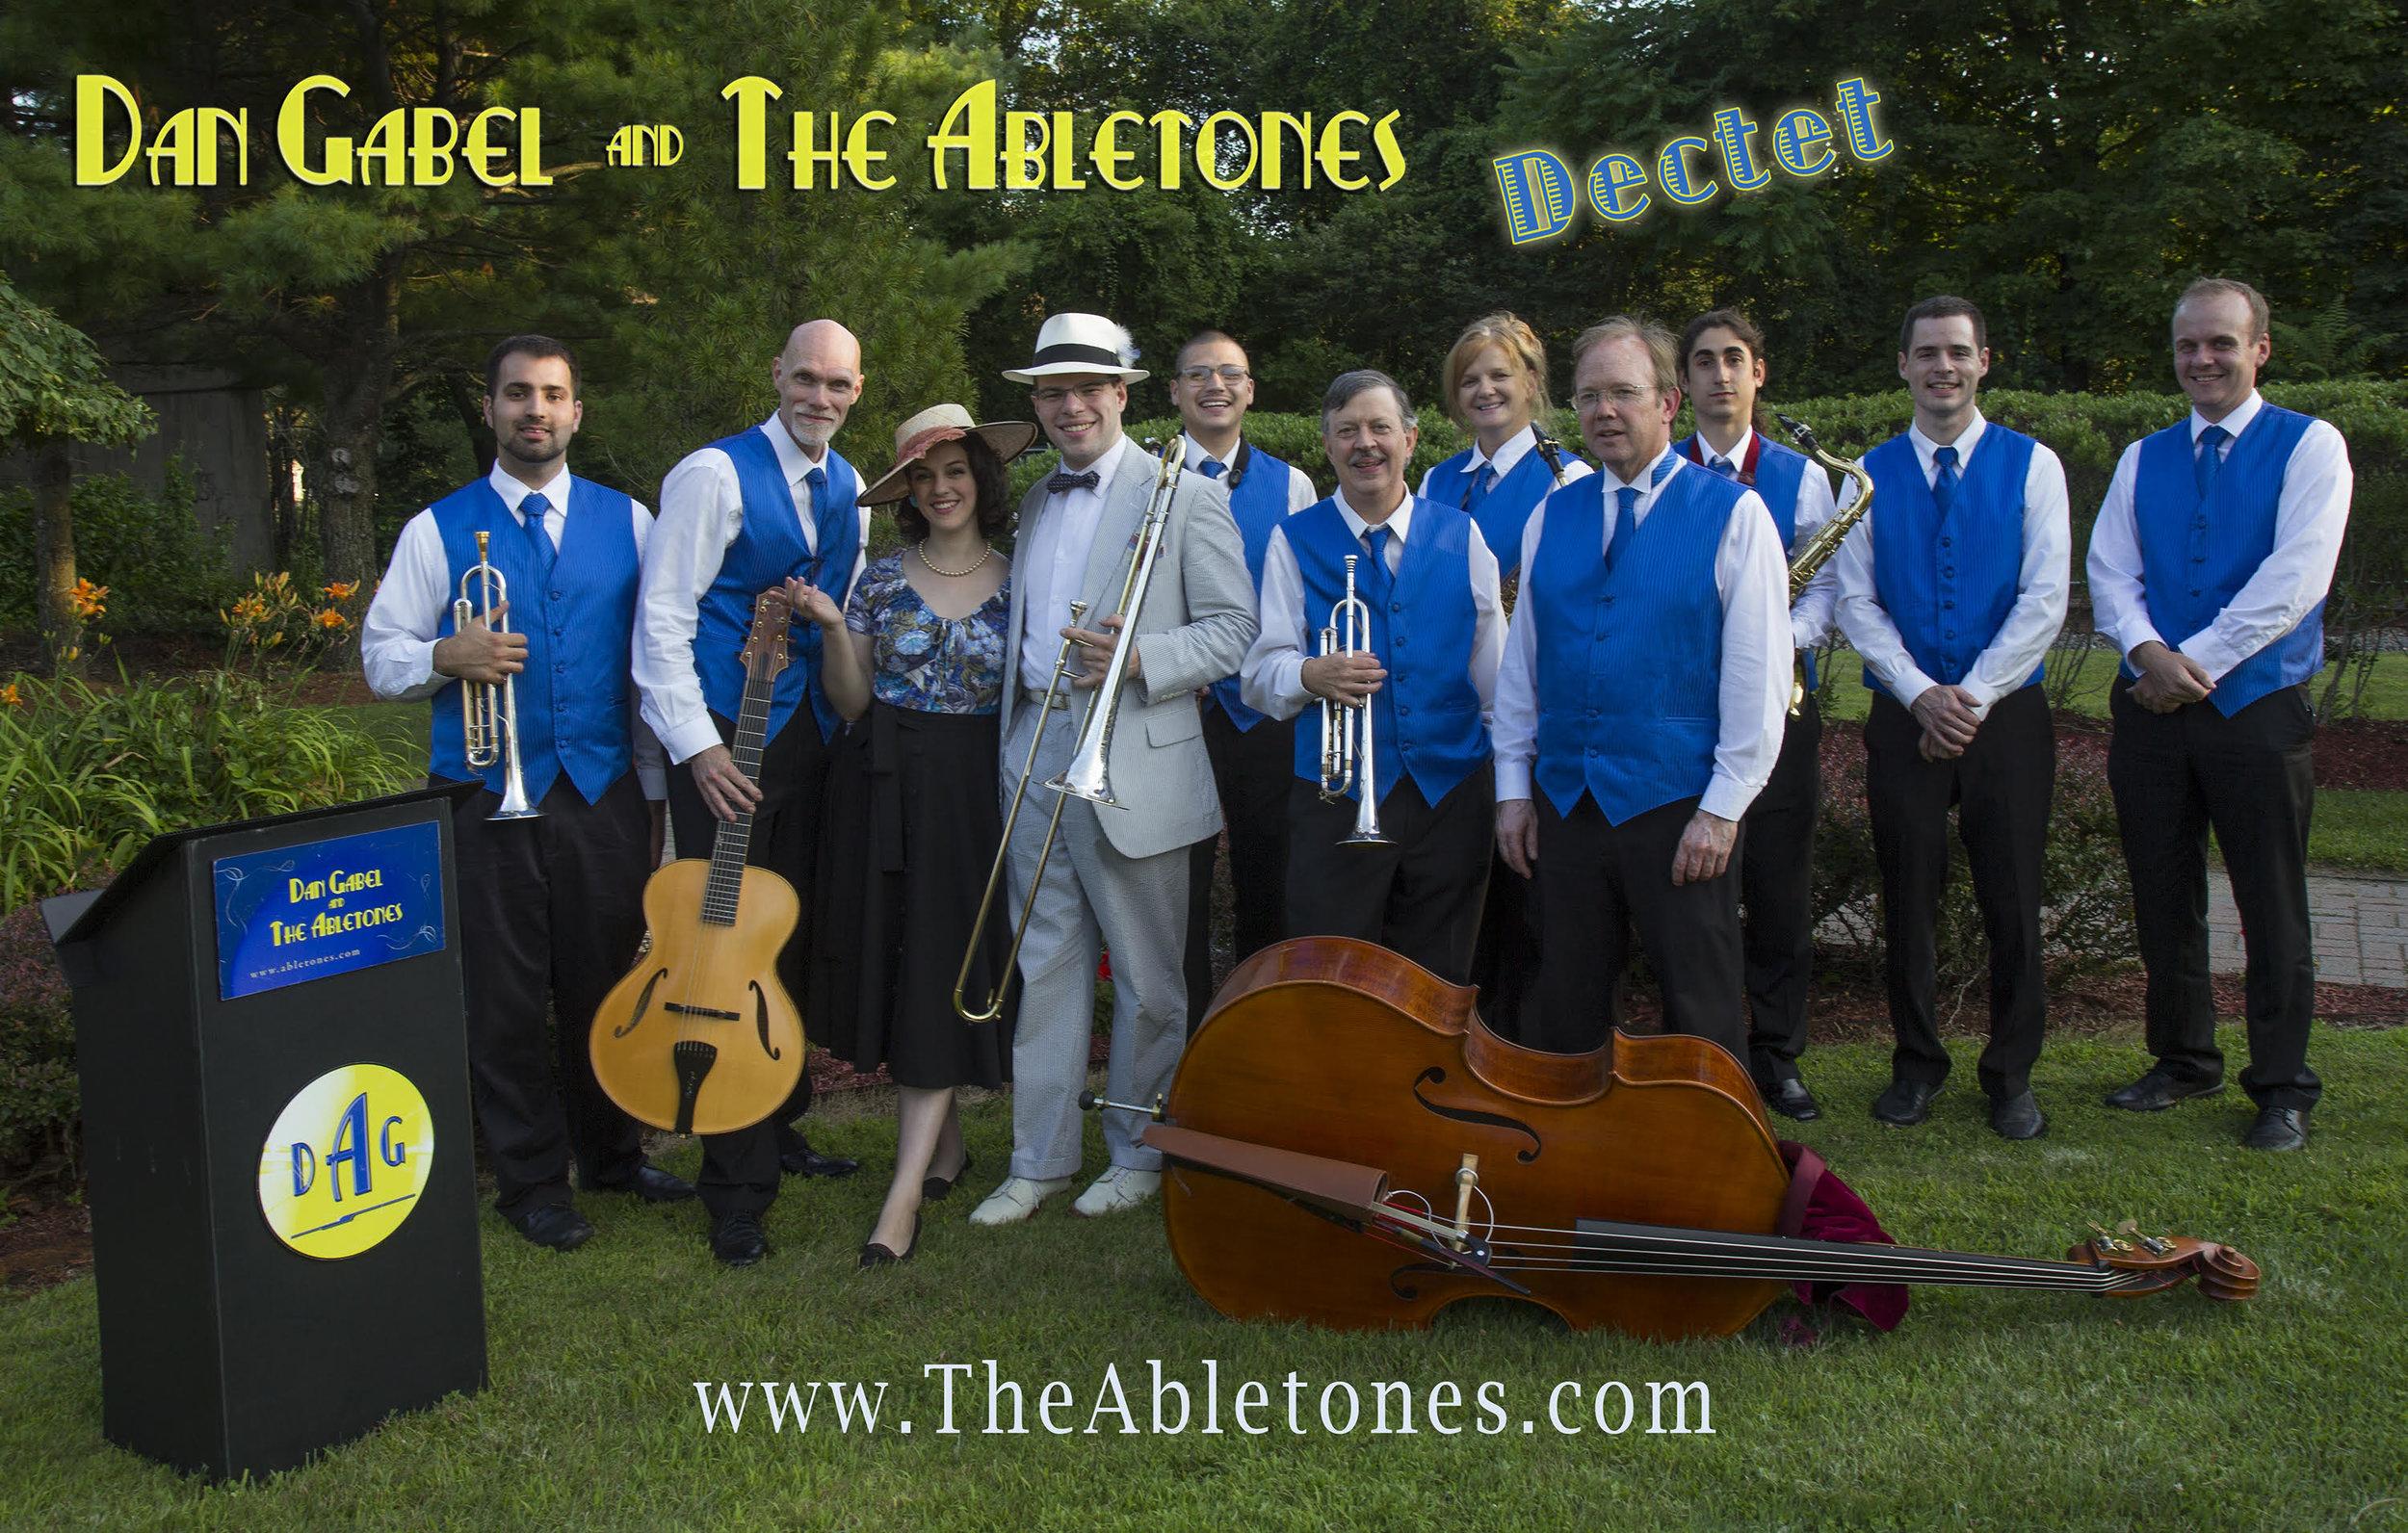 Dan Gabel and the Abletones Dectet promo.jpg